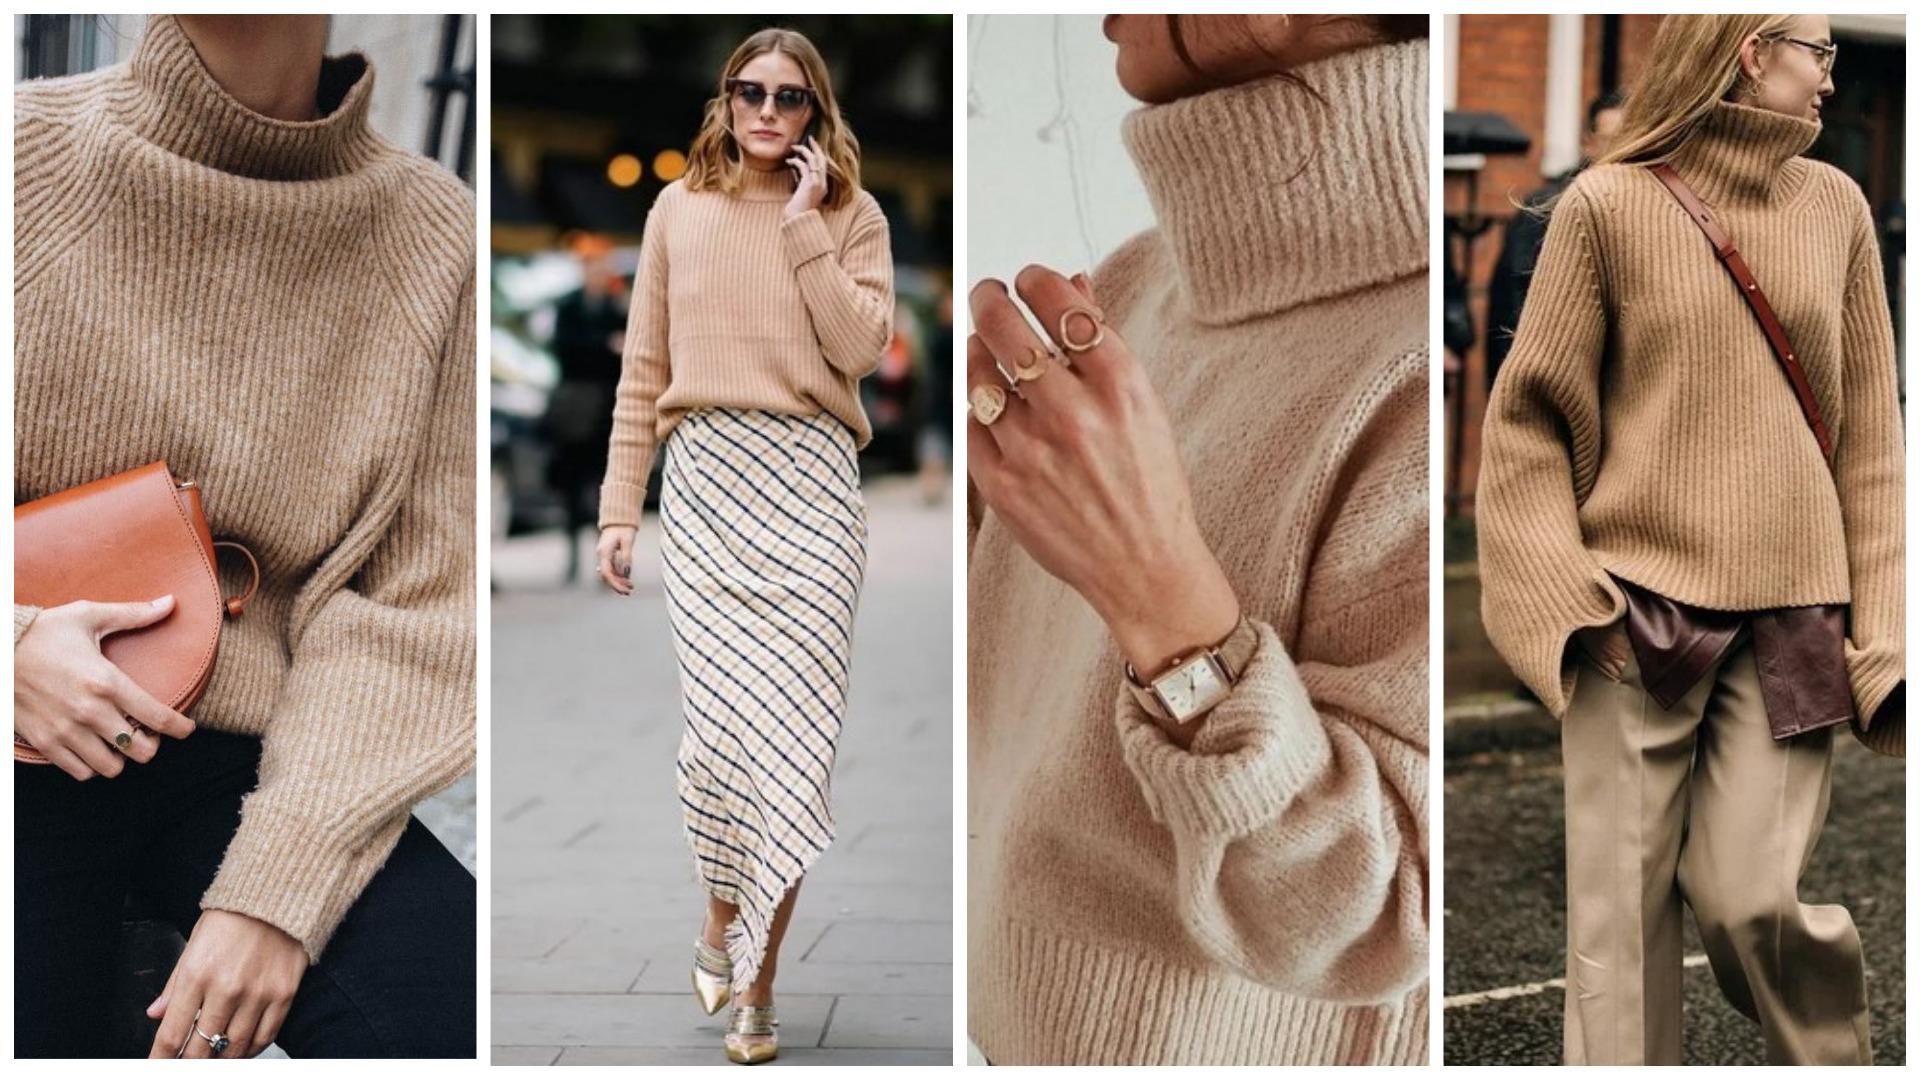 джемпер песочного цвета, мода осени 2020, тренды осени